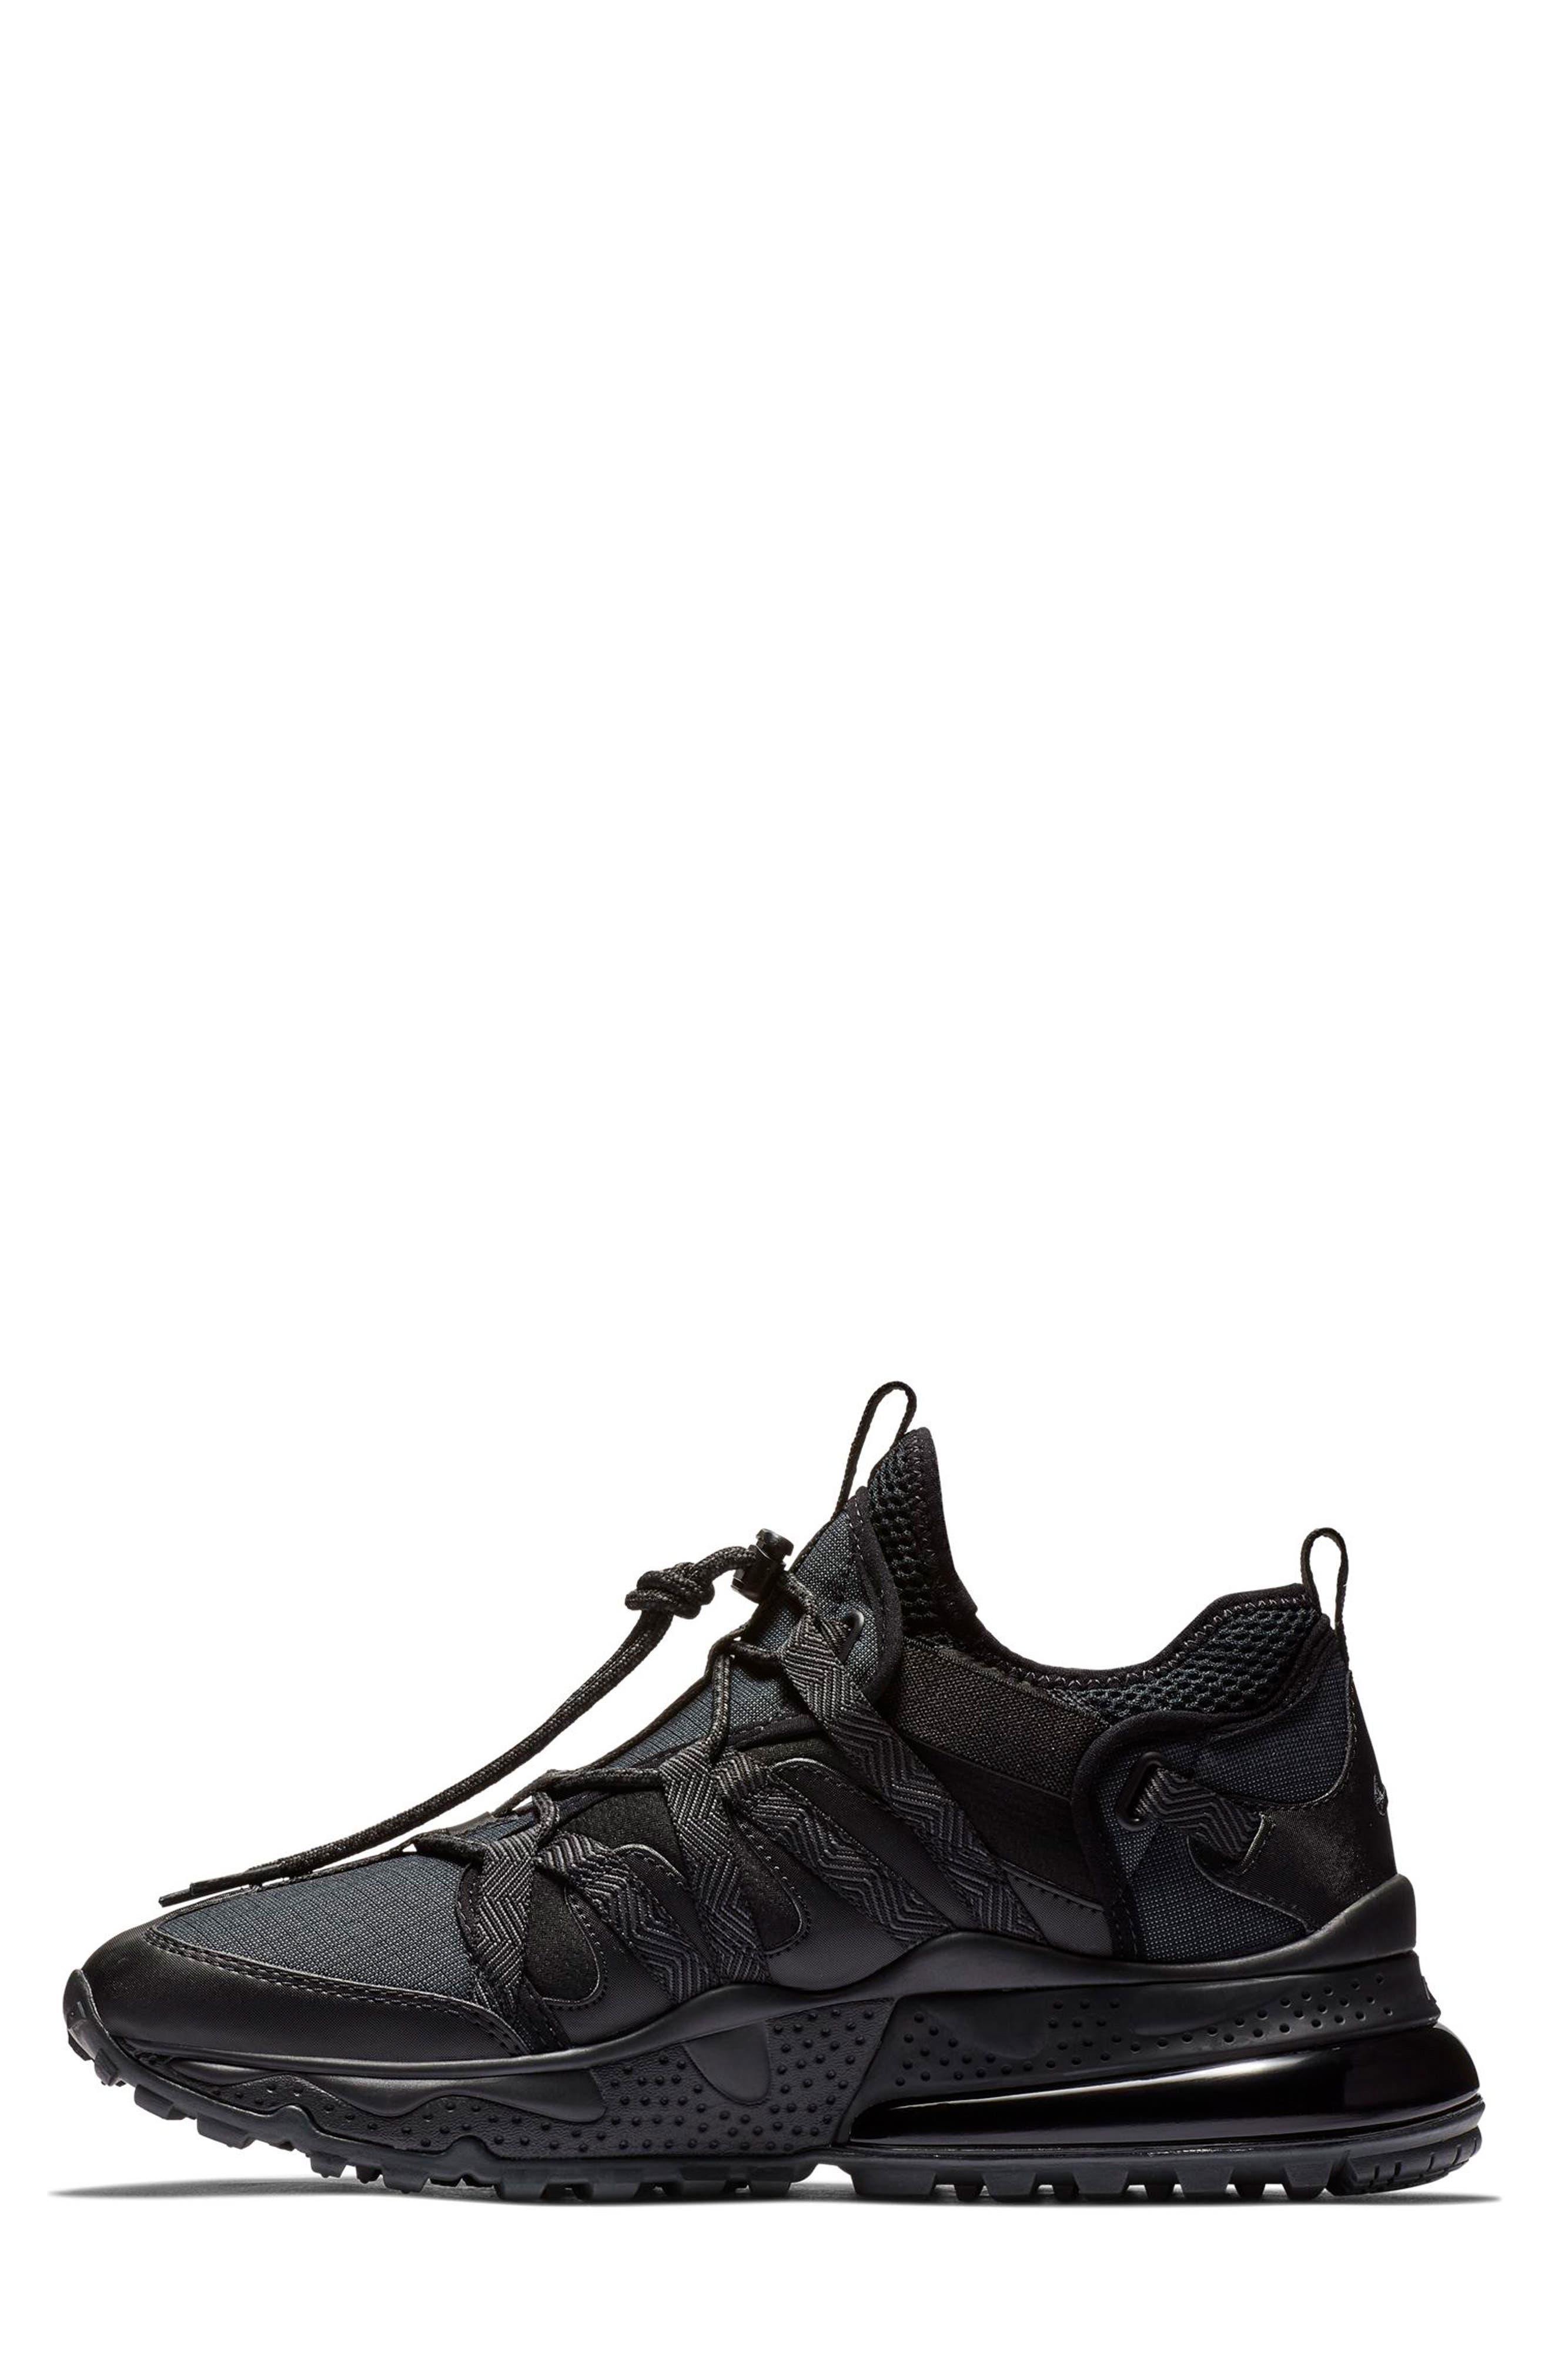 Air Max 270 Bowfin Sneaker,                             Alternate thumbnail 6, color,                             BLACK/ ANTHRACITE/ BLACK